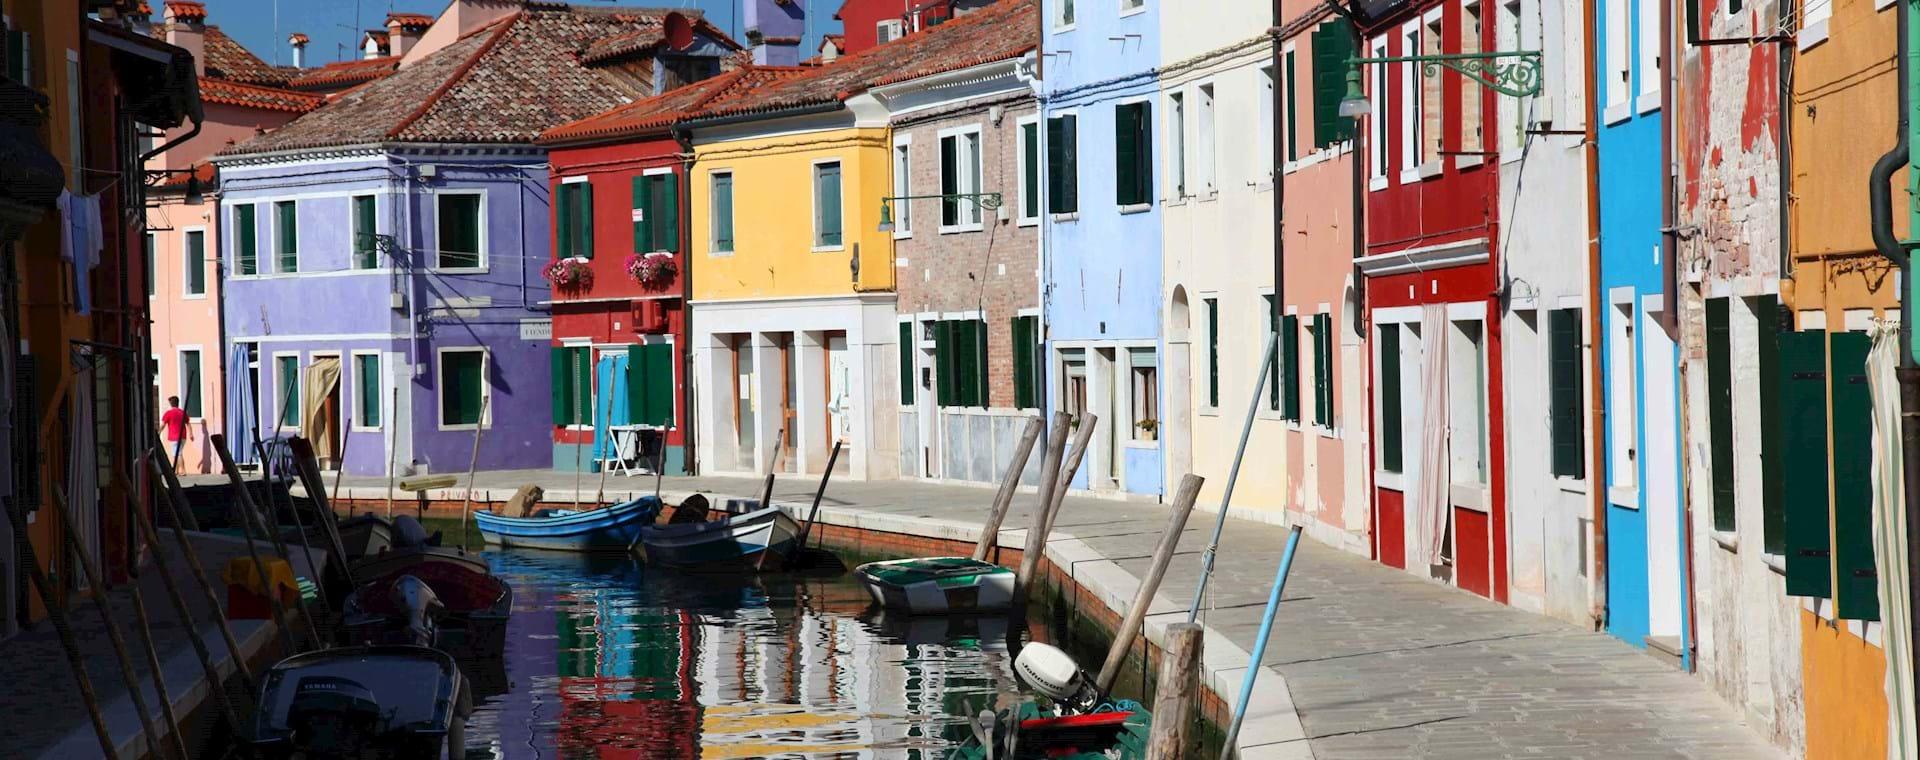 Venetian Islands Tour: Murano Glassblowing & Burano Lacemaking